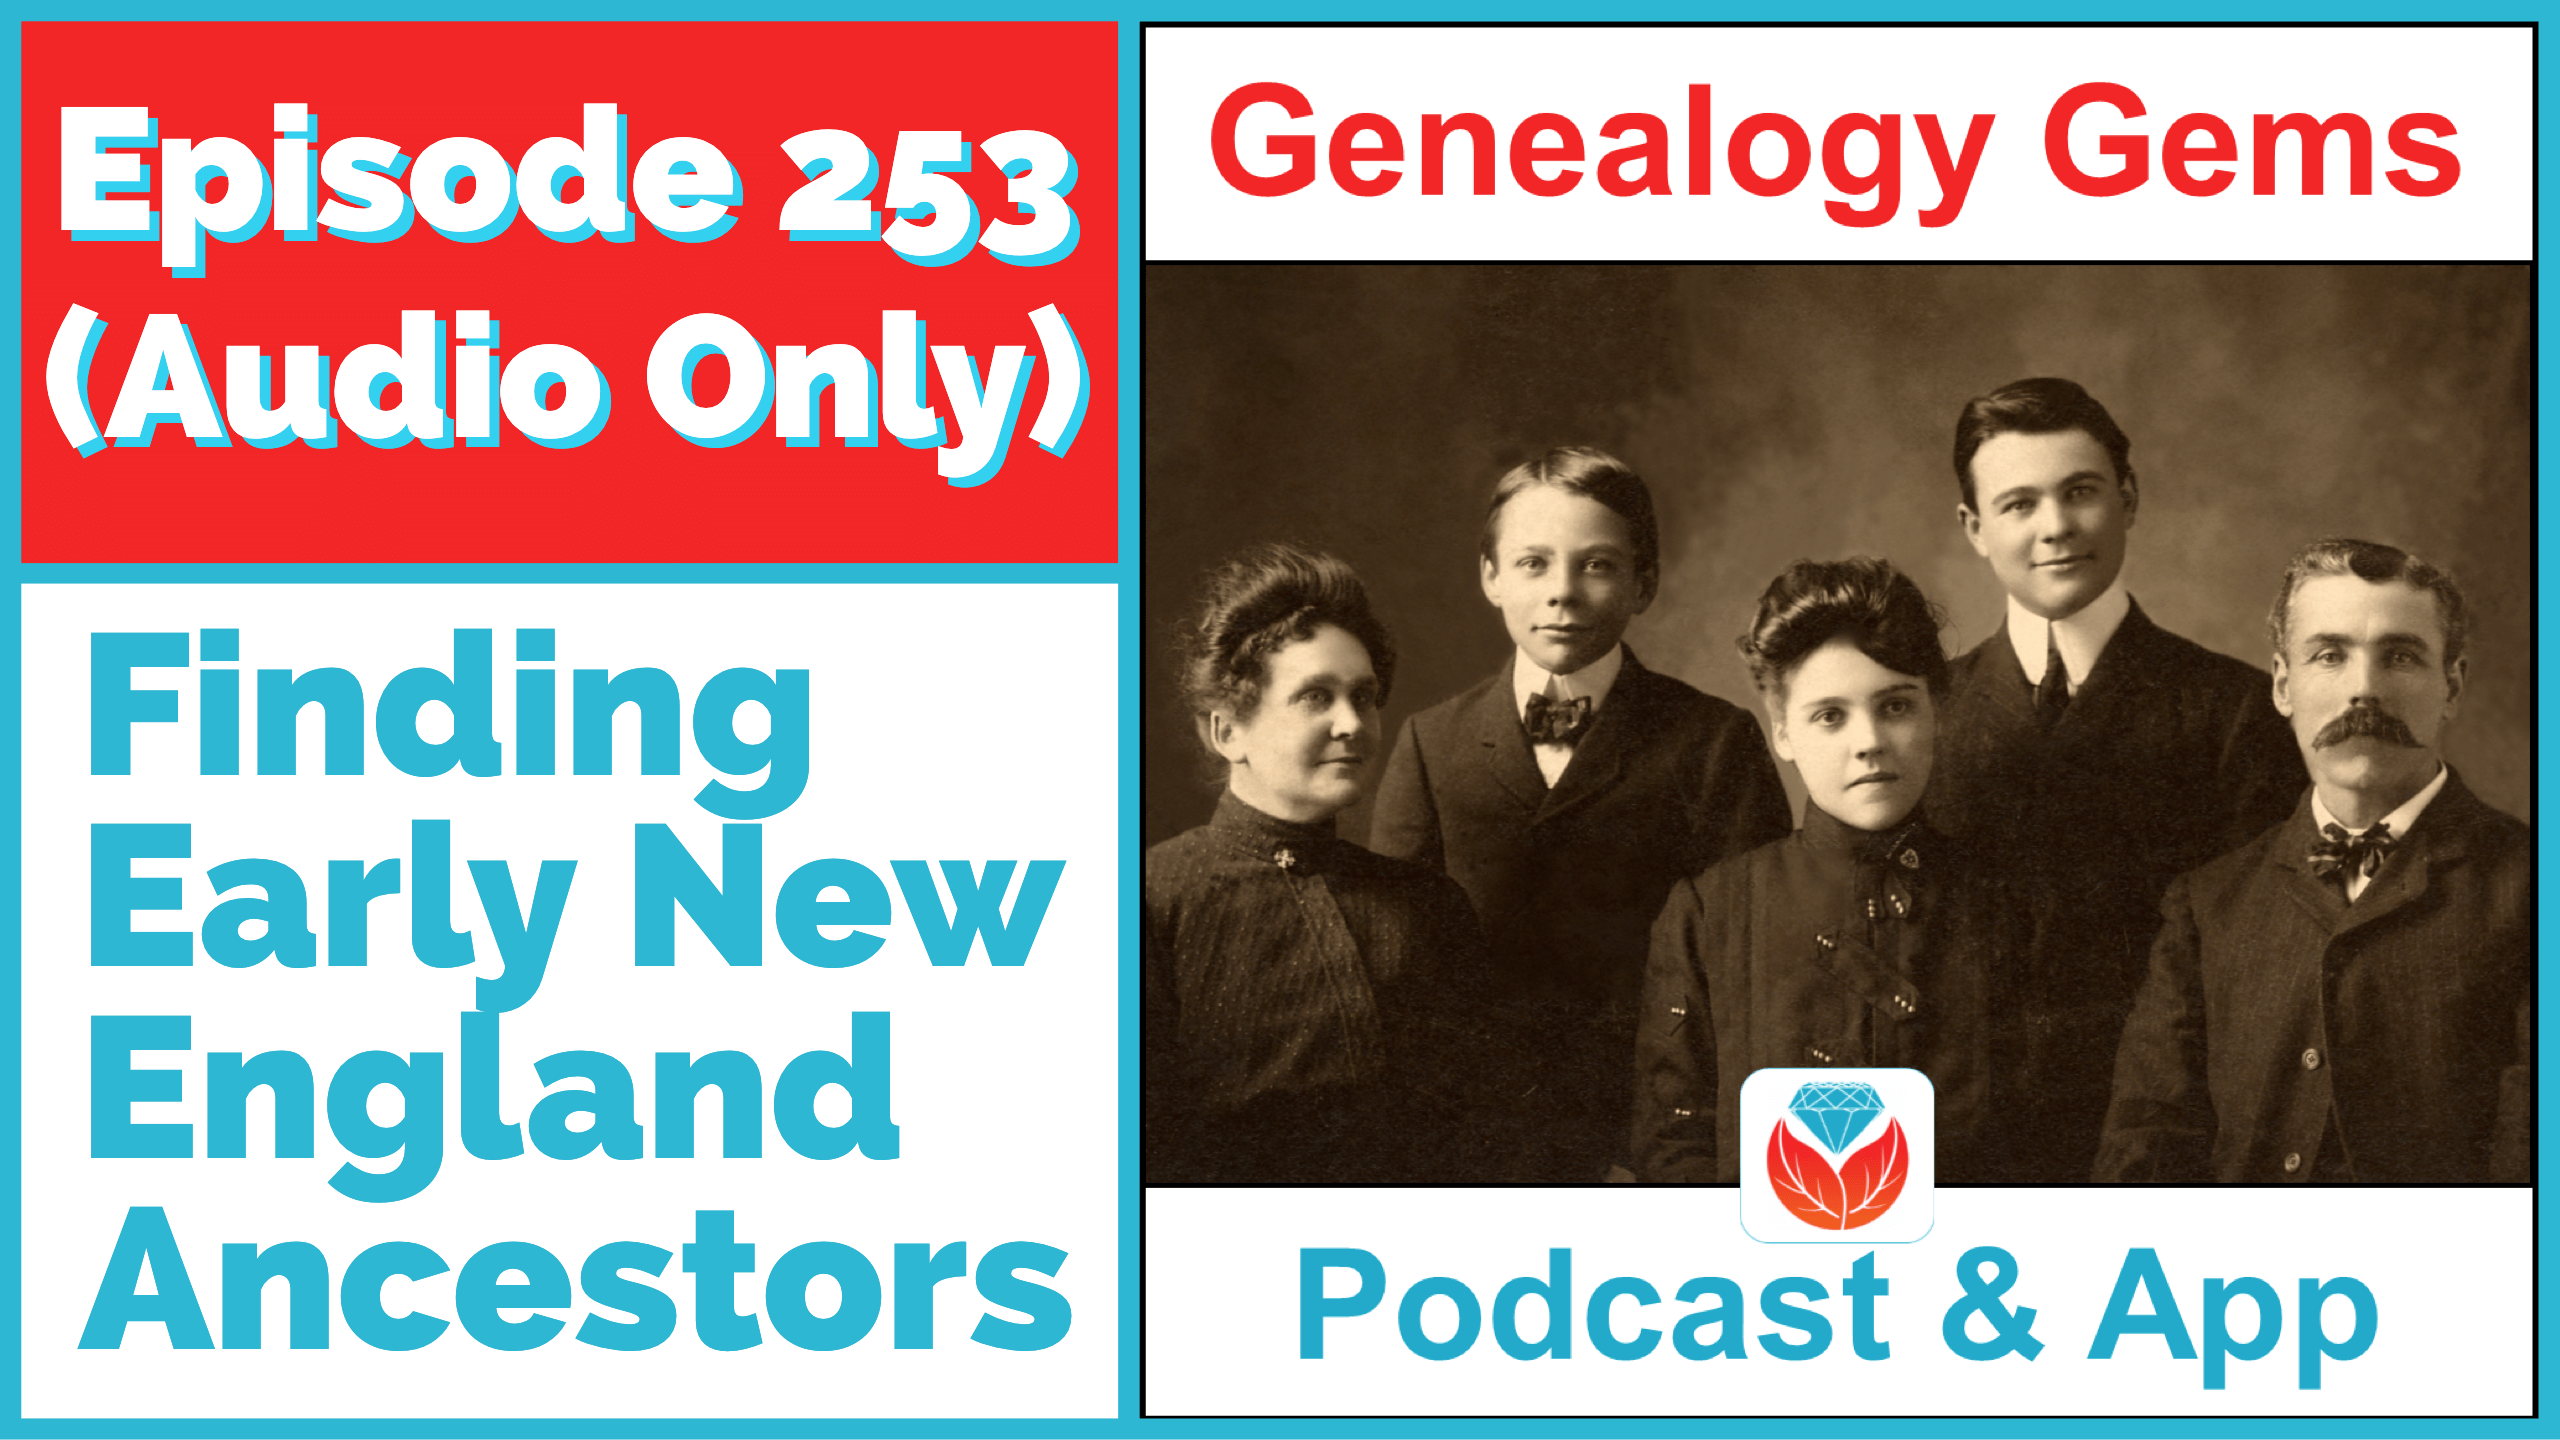 Genealogy Gems Podcast Episode 253